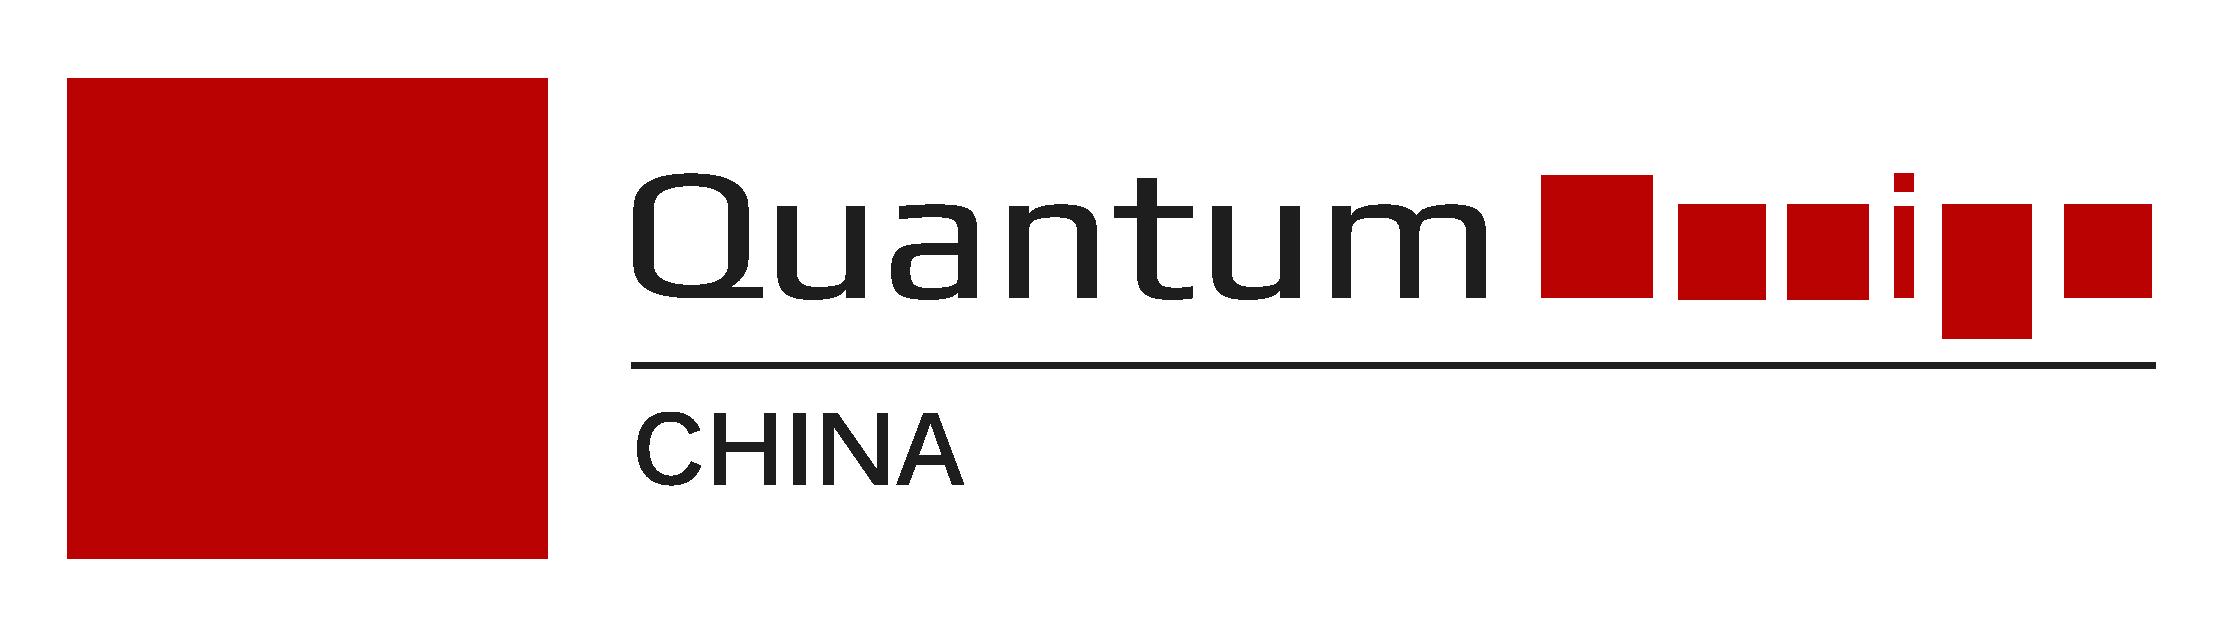 Quantum Design中国子公司